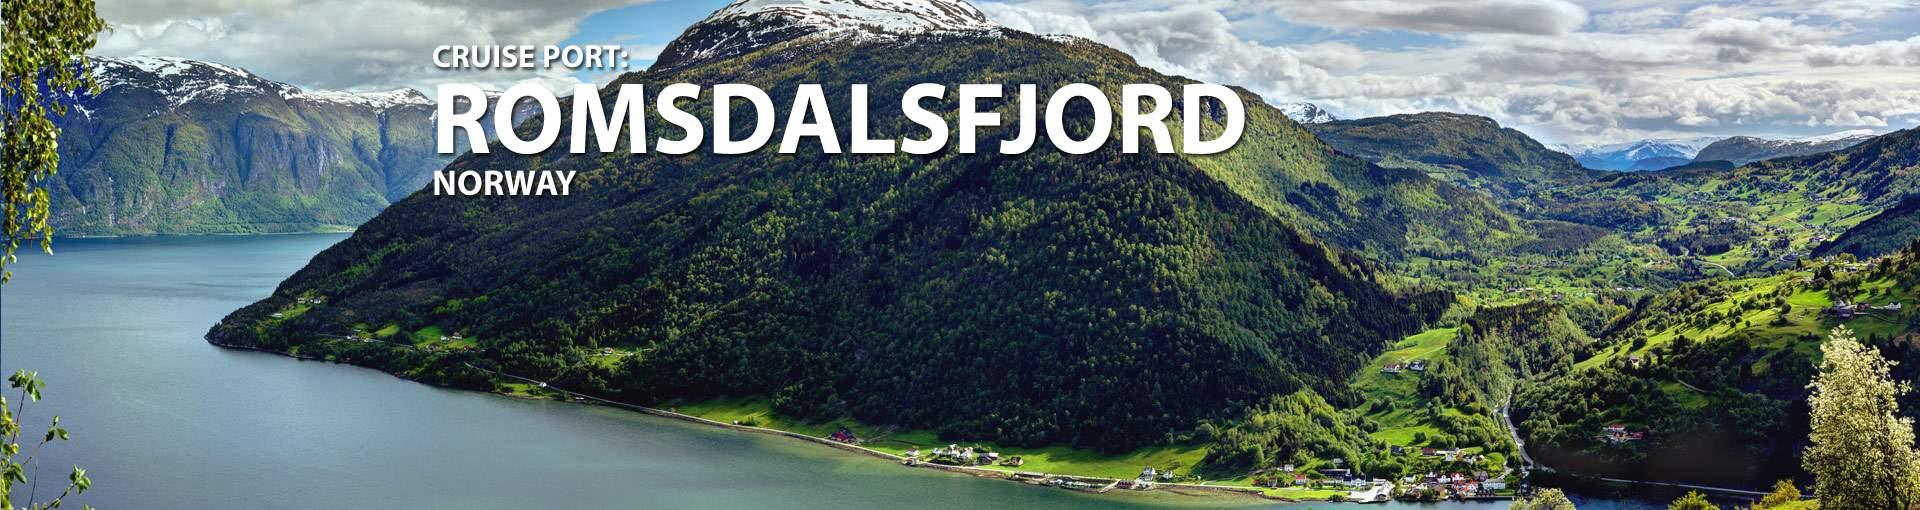 Romsdalfjord, Norway Cruise Port